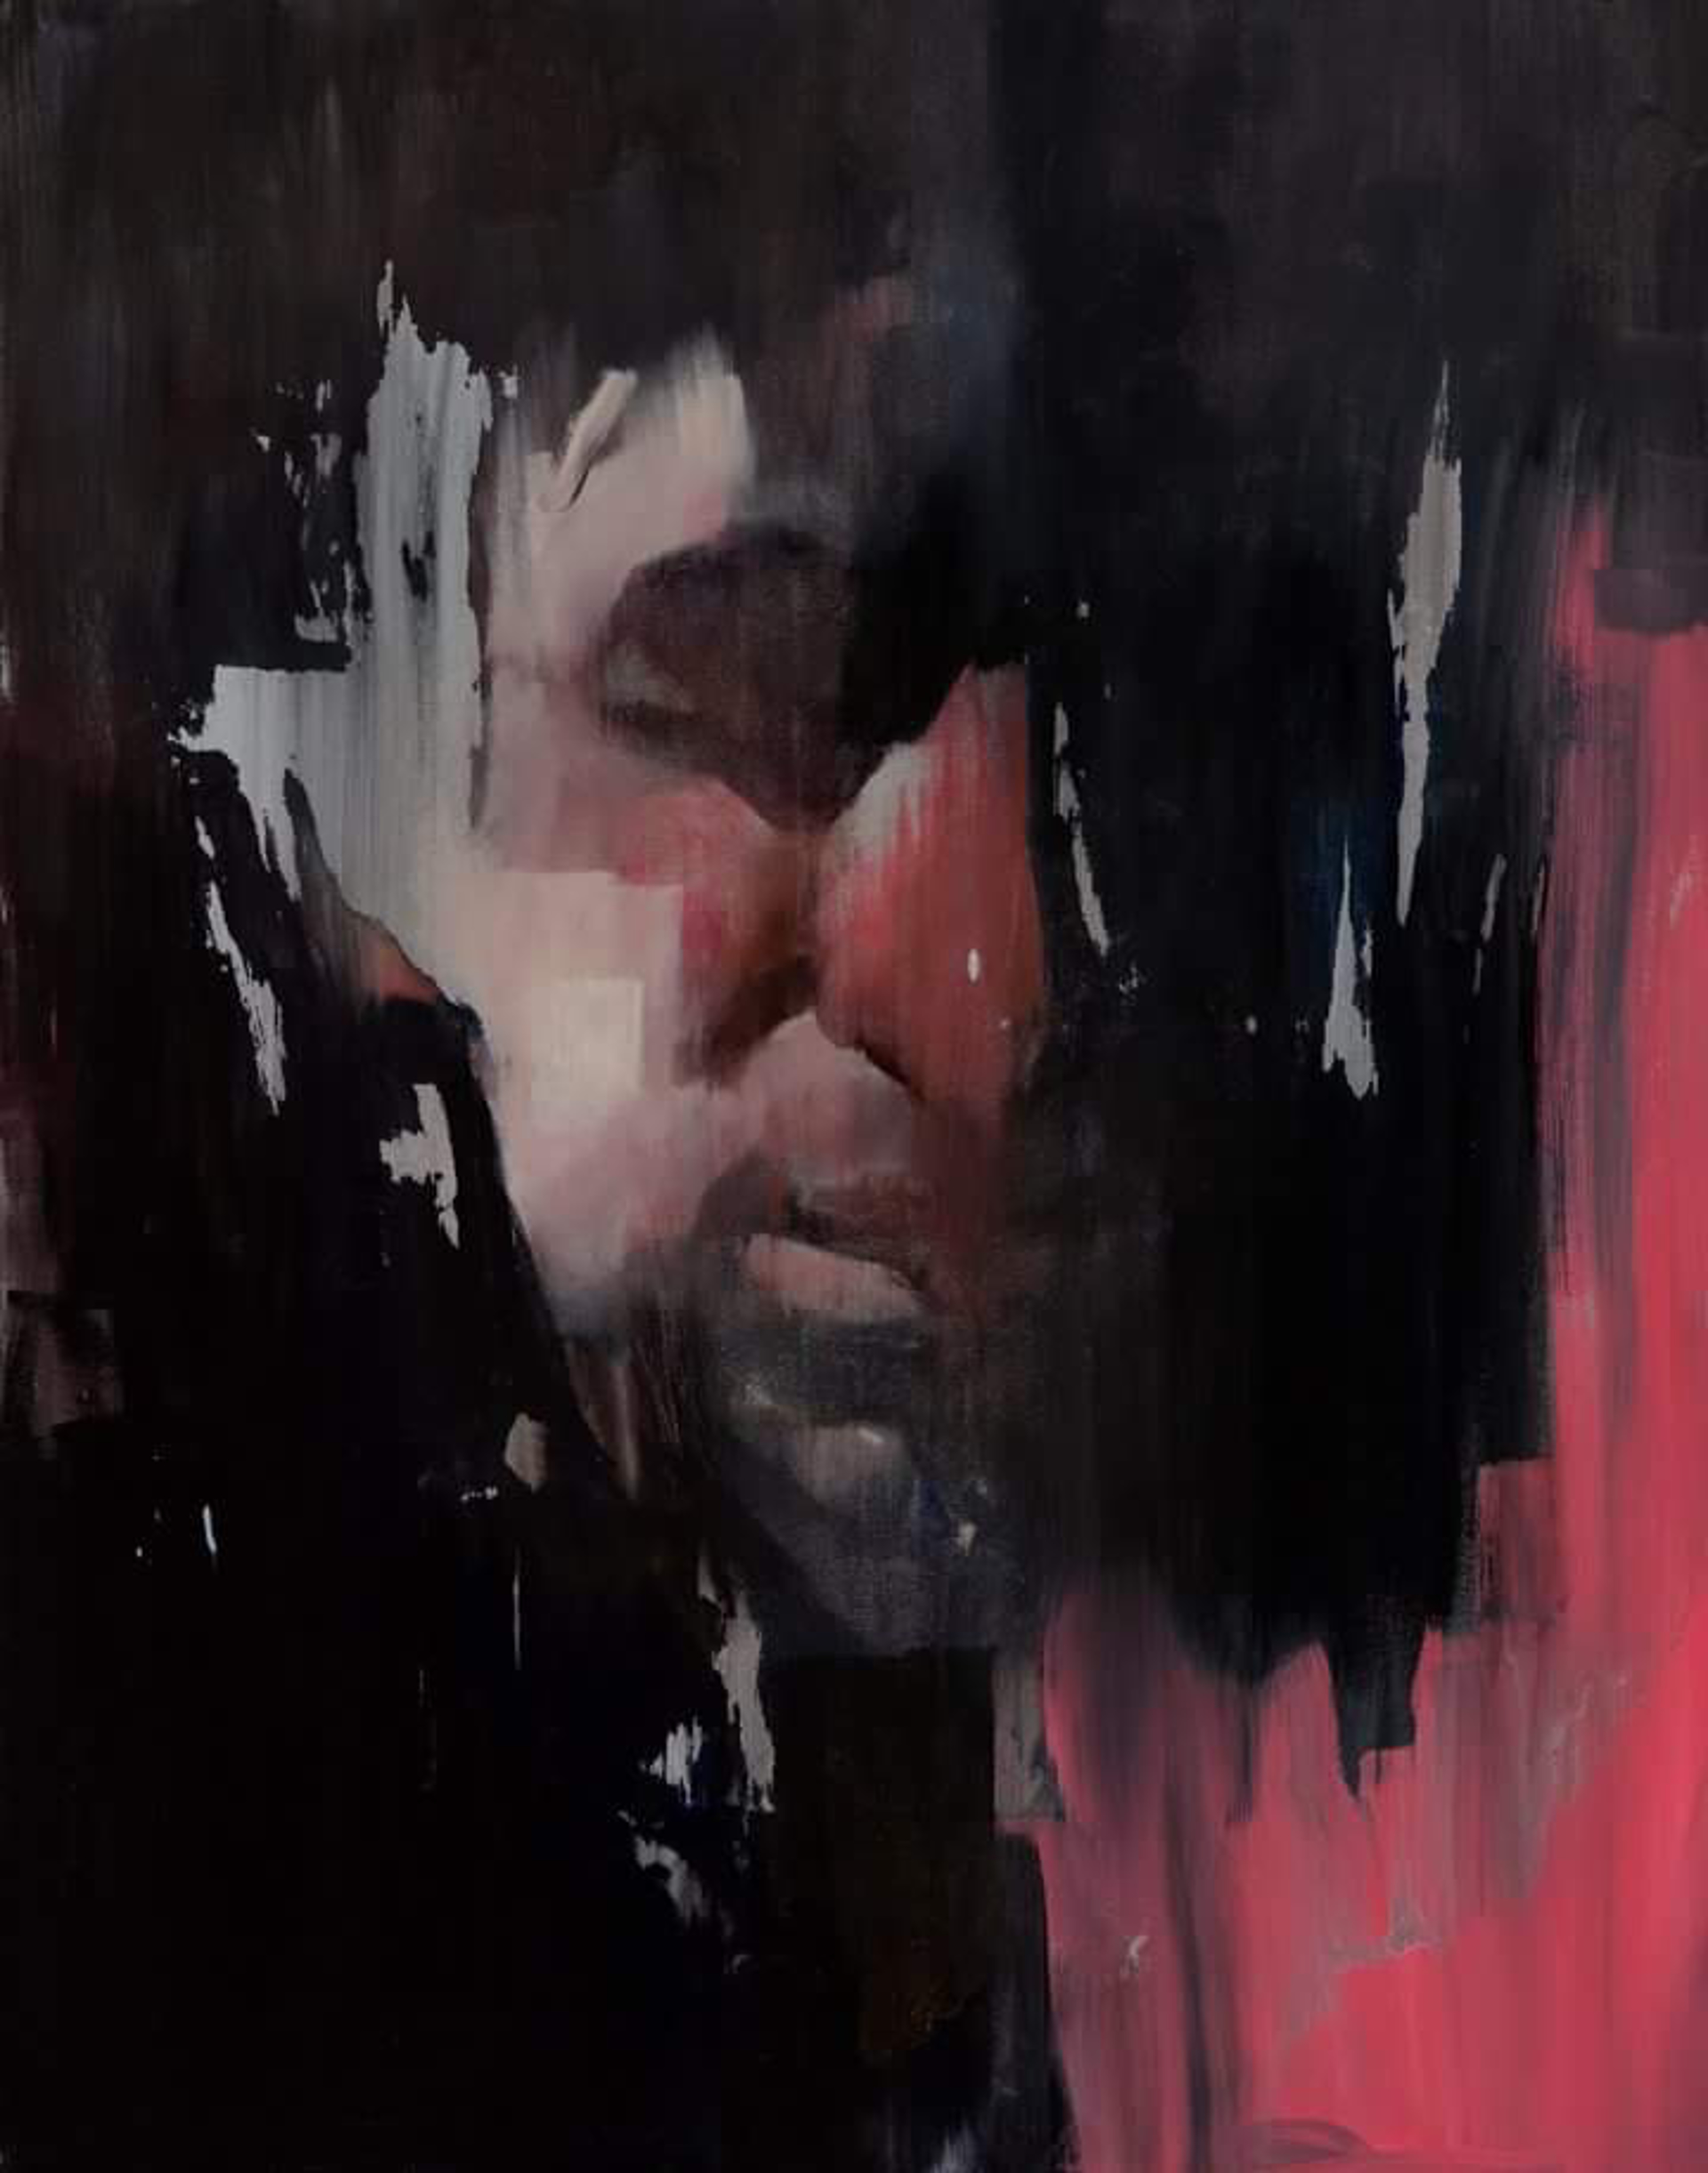 Memory by Nick Runge